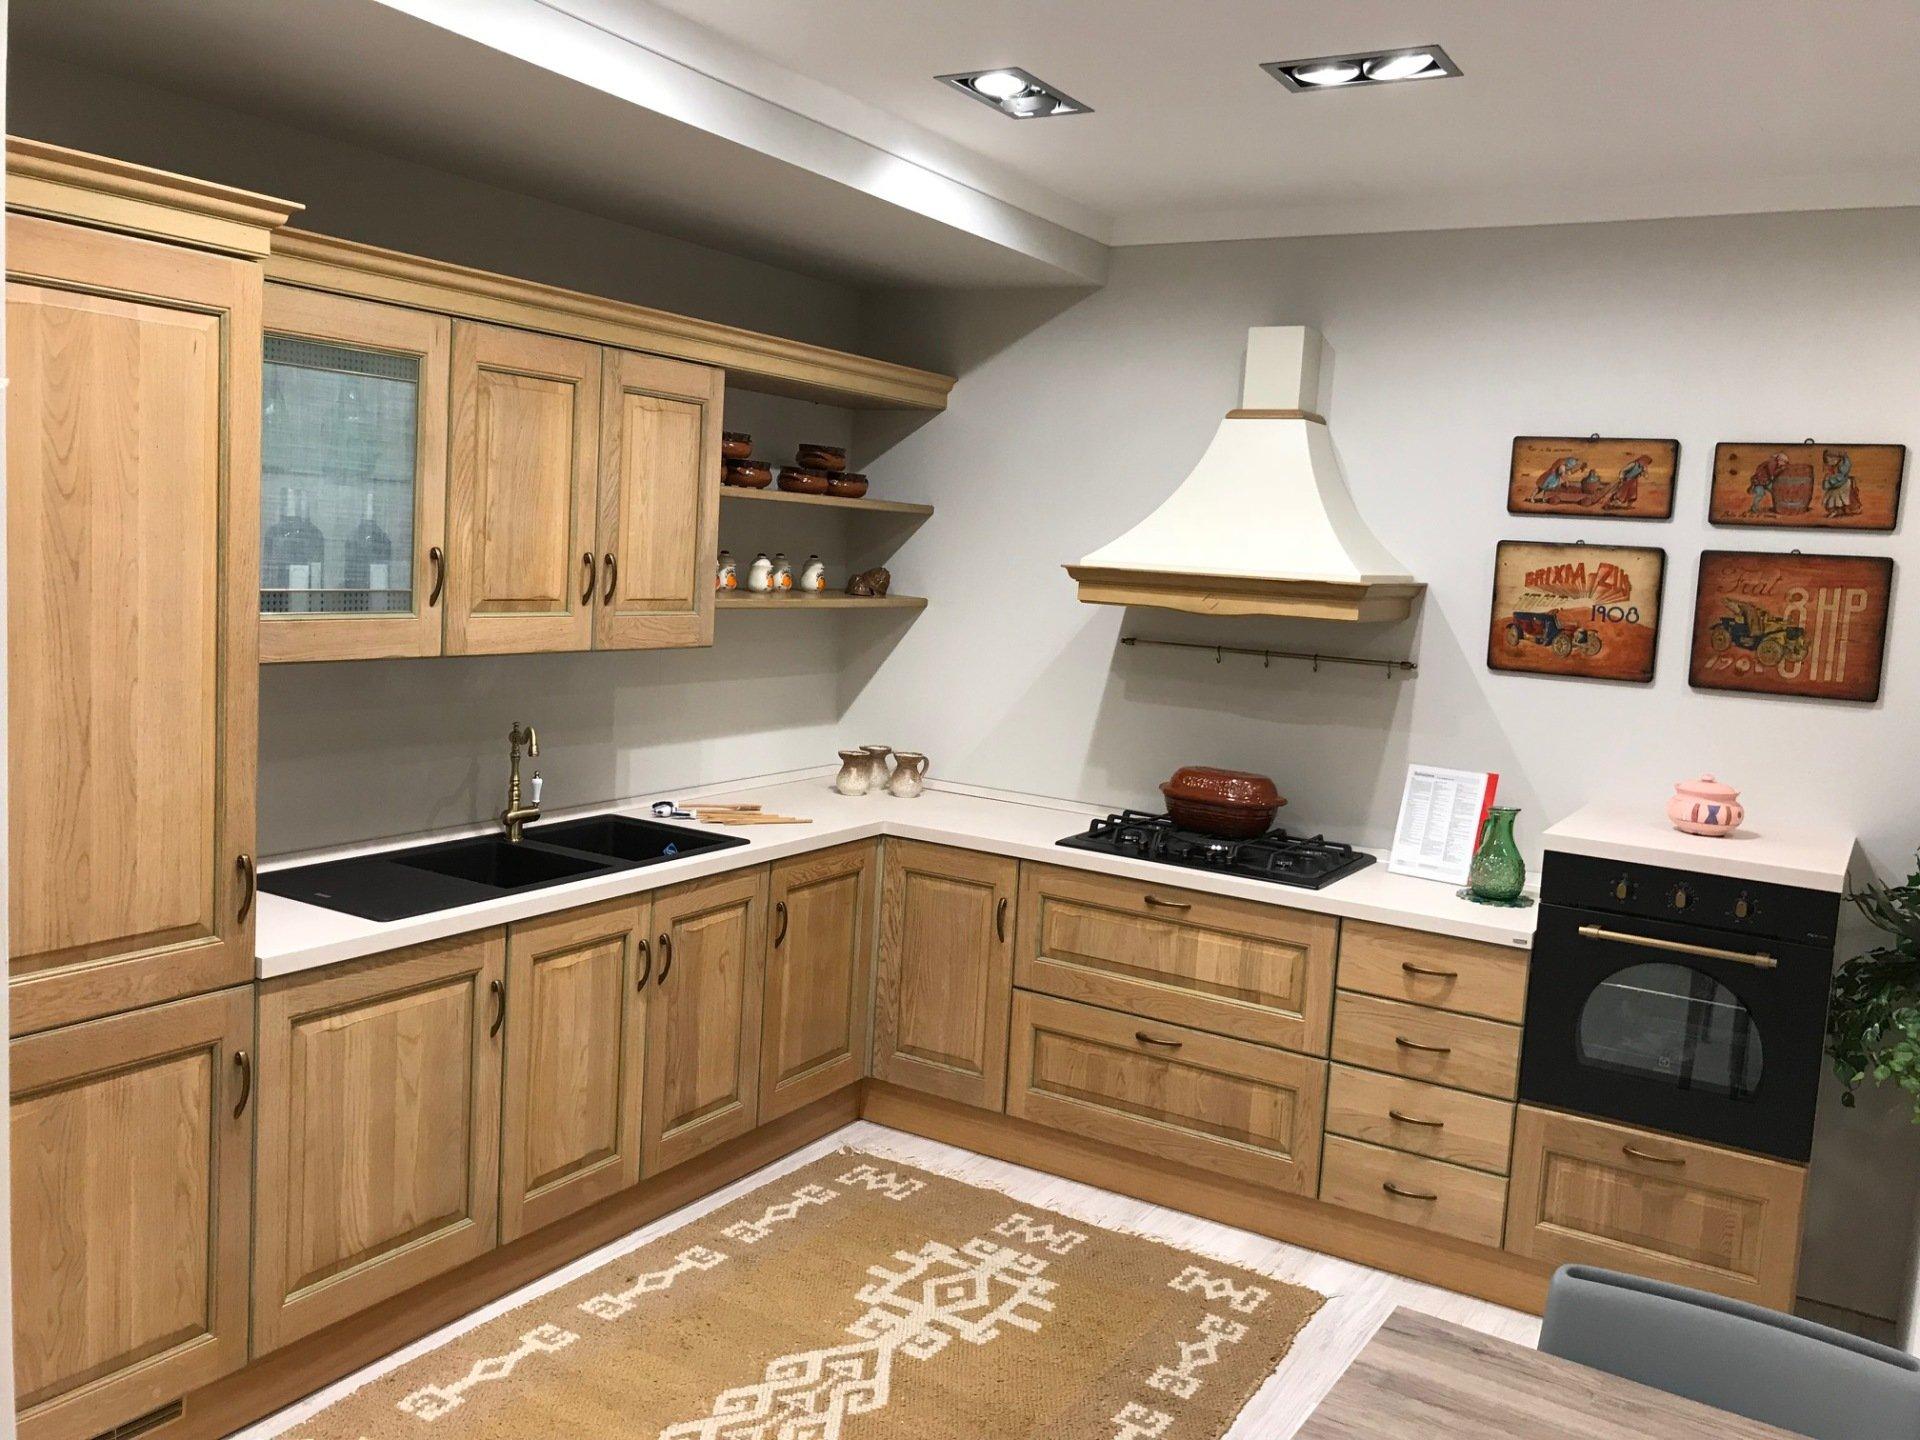 Outlet arredamento - Oleggio - Novara - Arredamenti Lorenzini